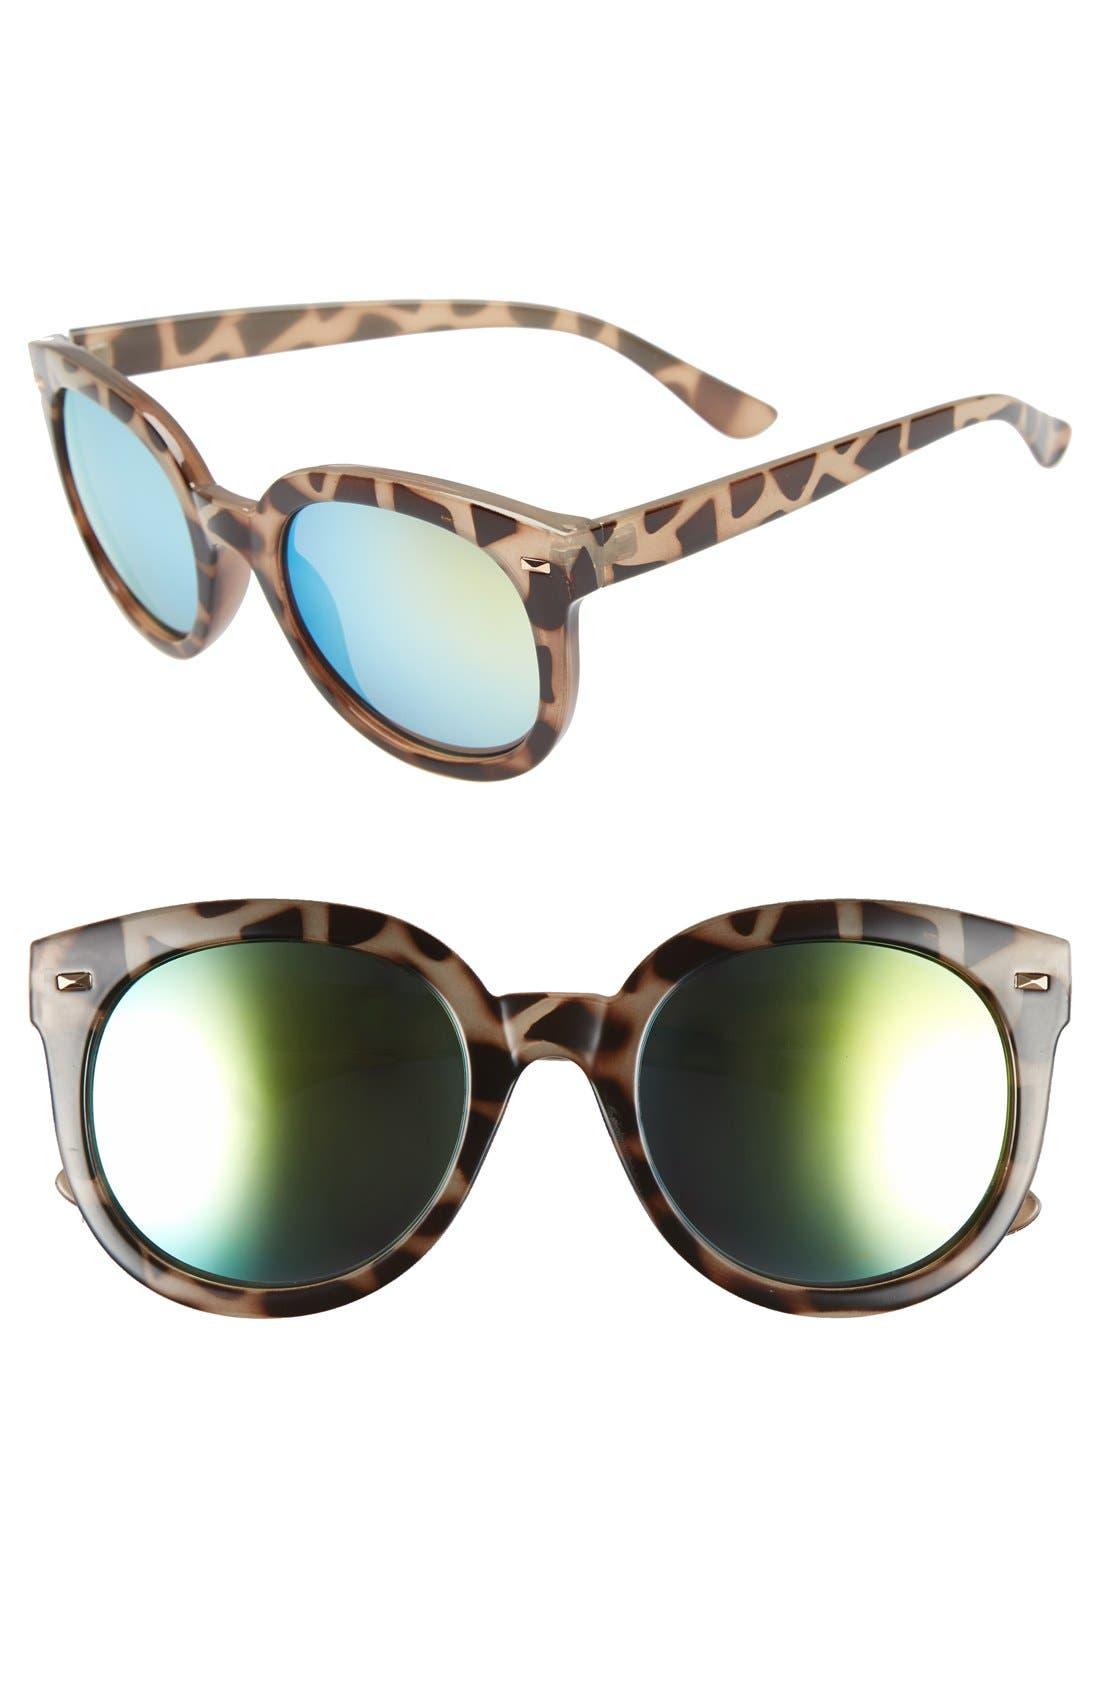 a4c5c174529c BP. Sunglasses for Women